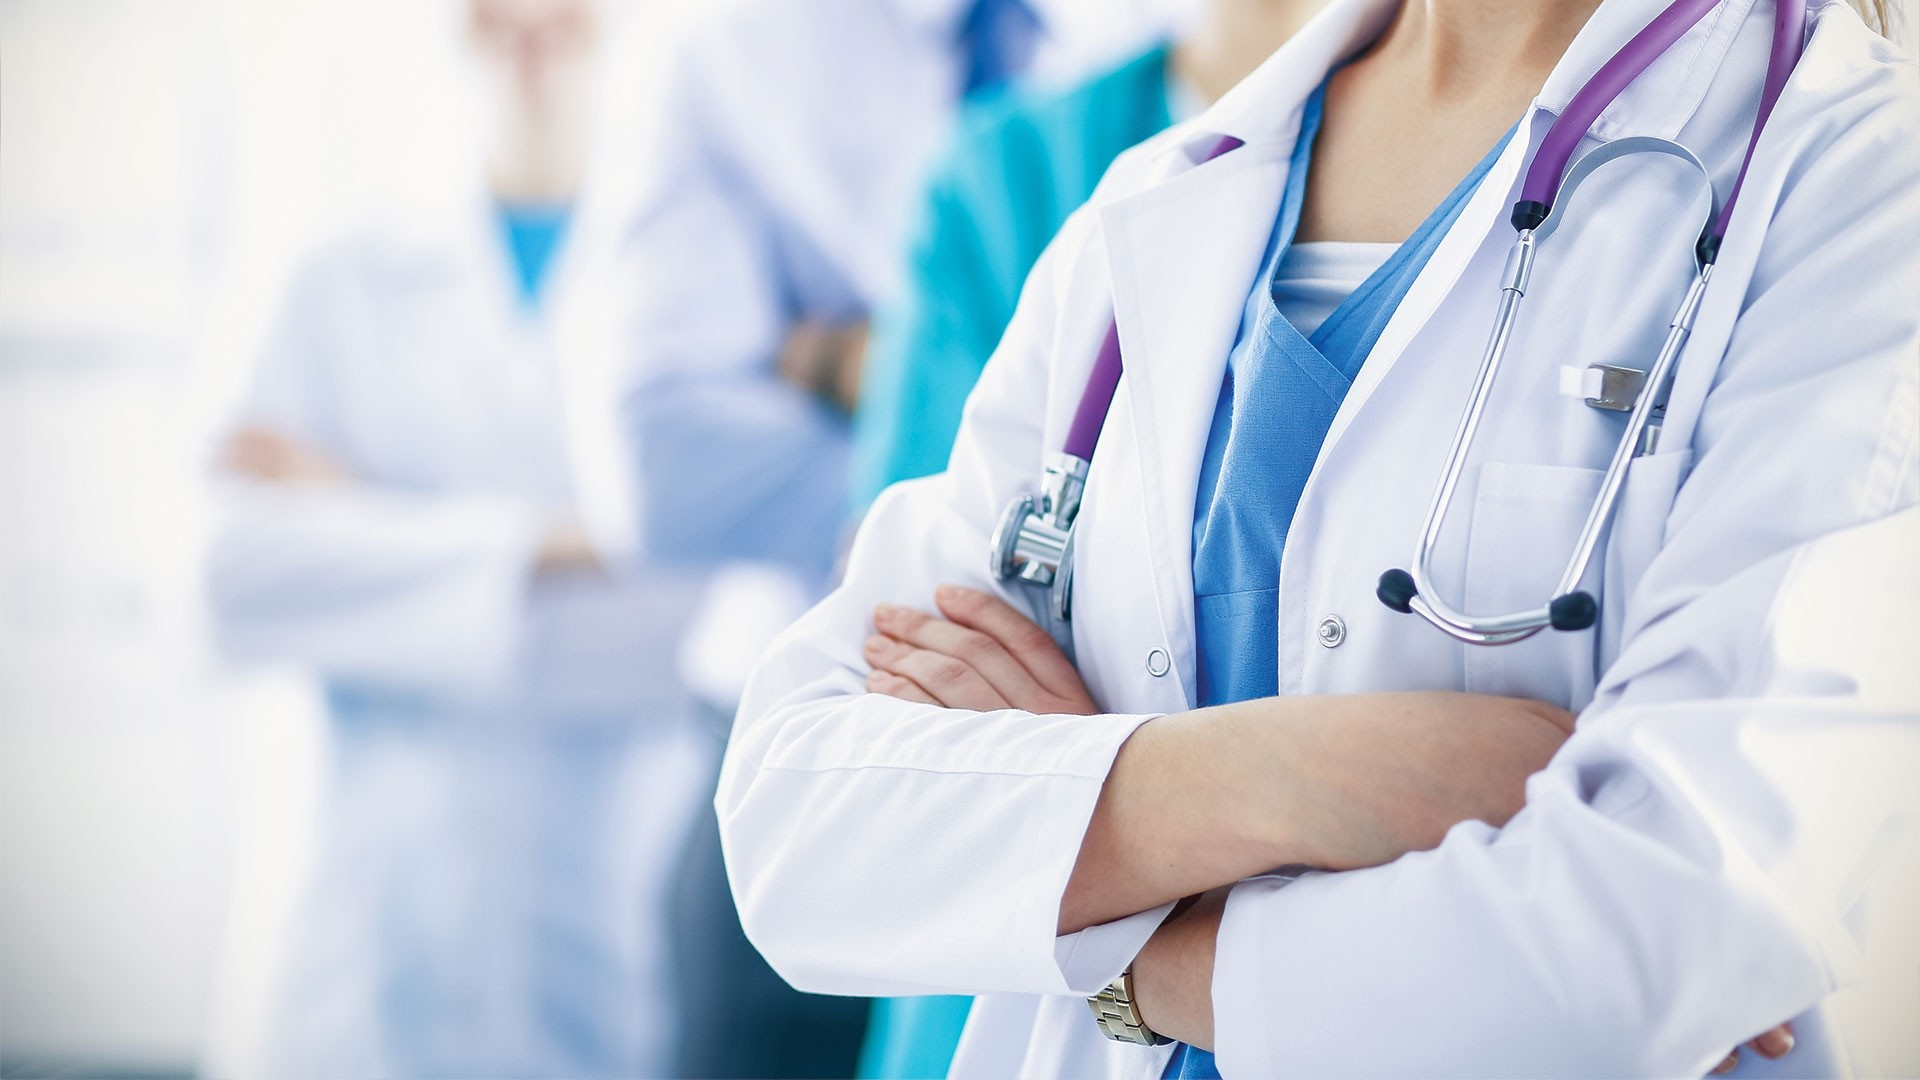 Medical Desktop wallpaper